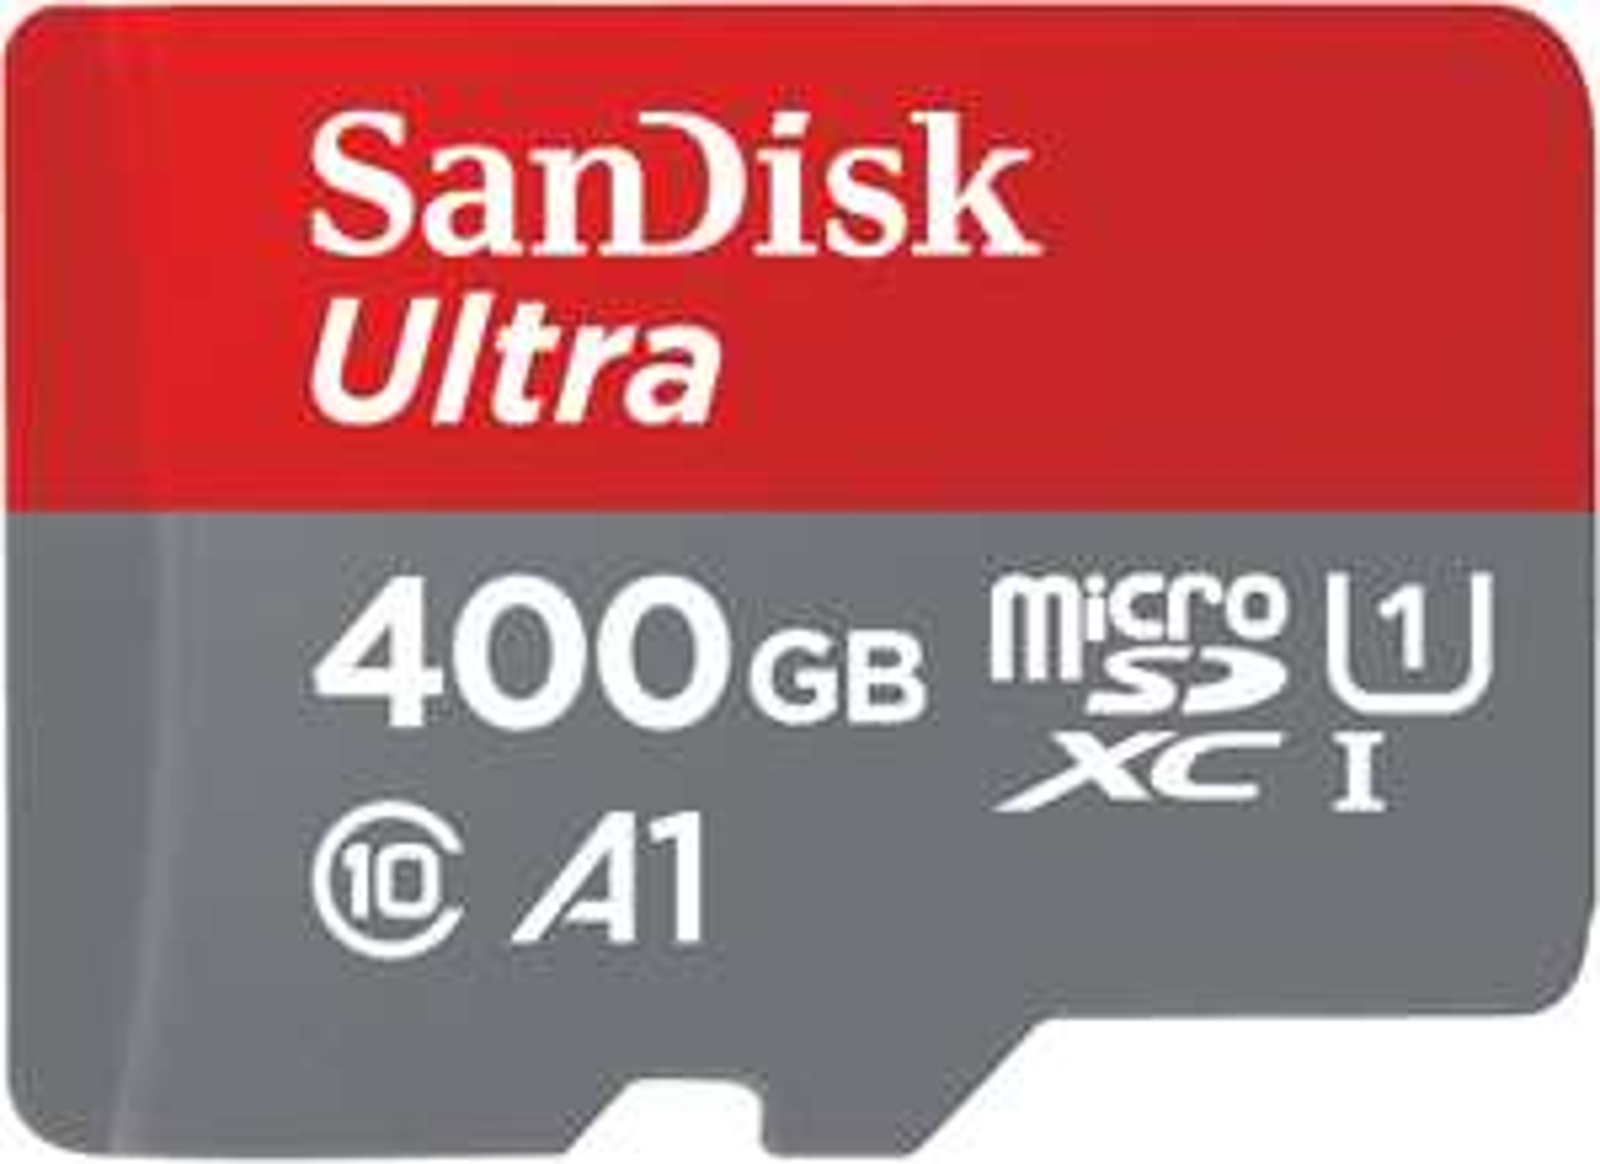 SANDISK Ultra 400GB microSDXC UHS-I Speicherkarte 100 MB/s für 45,37€ mit Visa inkl. Versandkosten